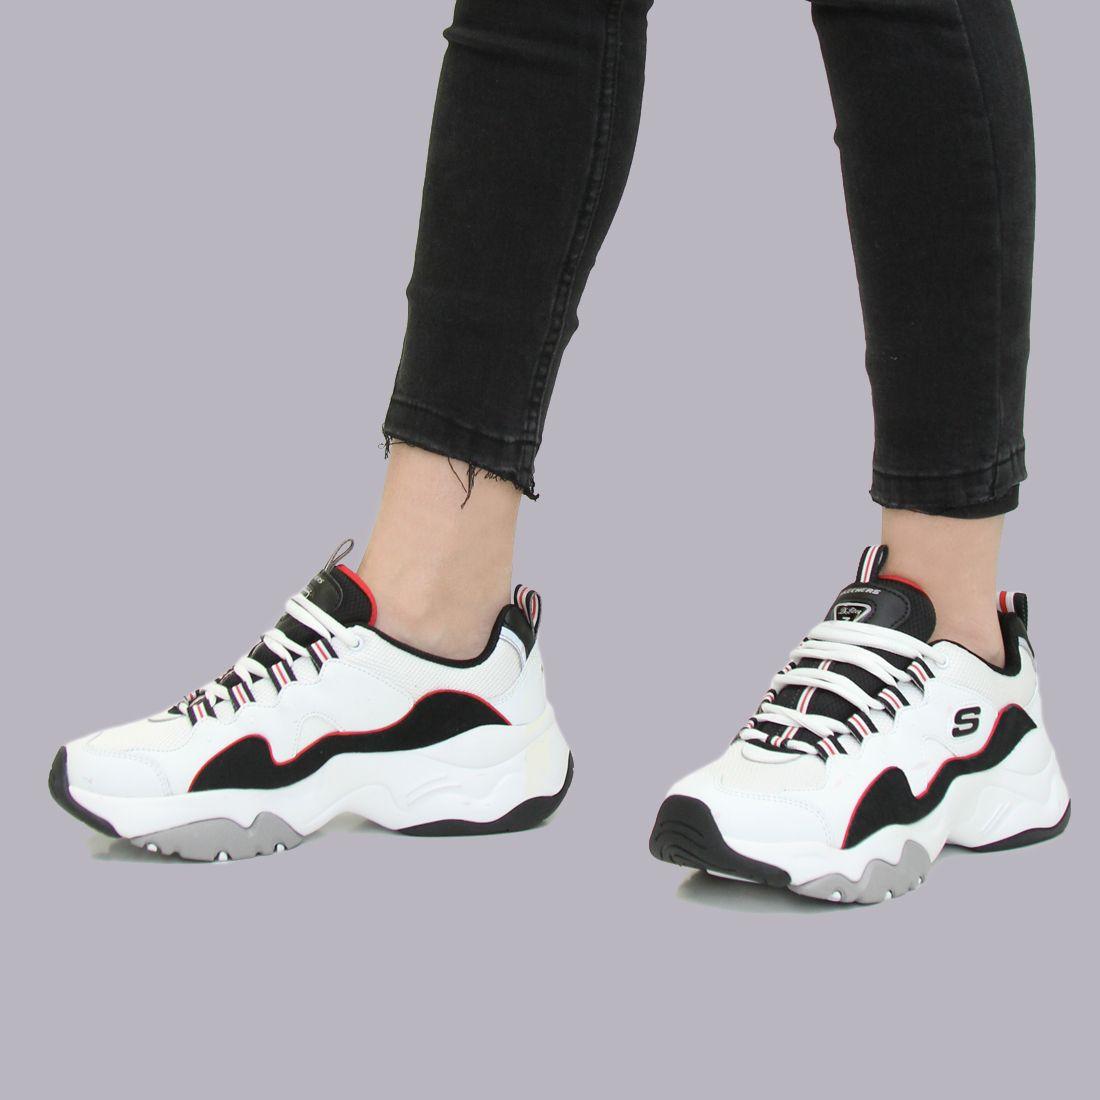 marca de zapatos deportivos skechers white